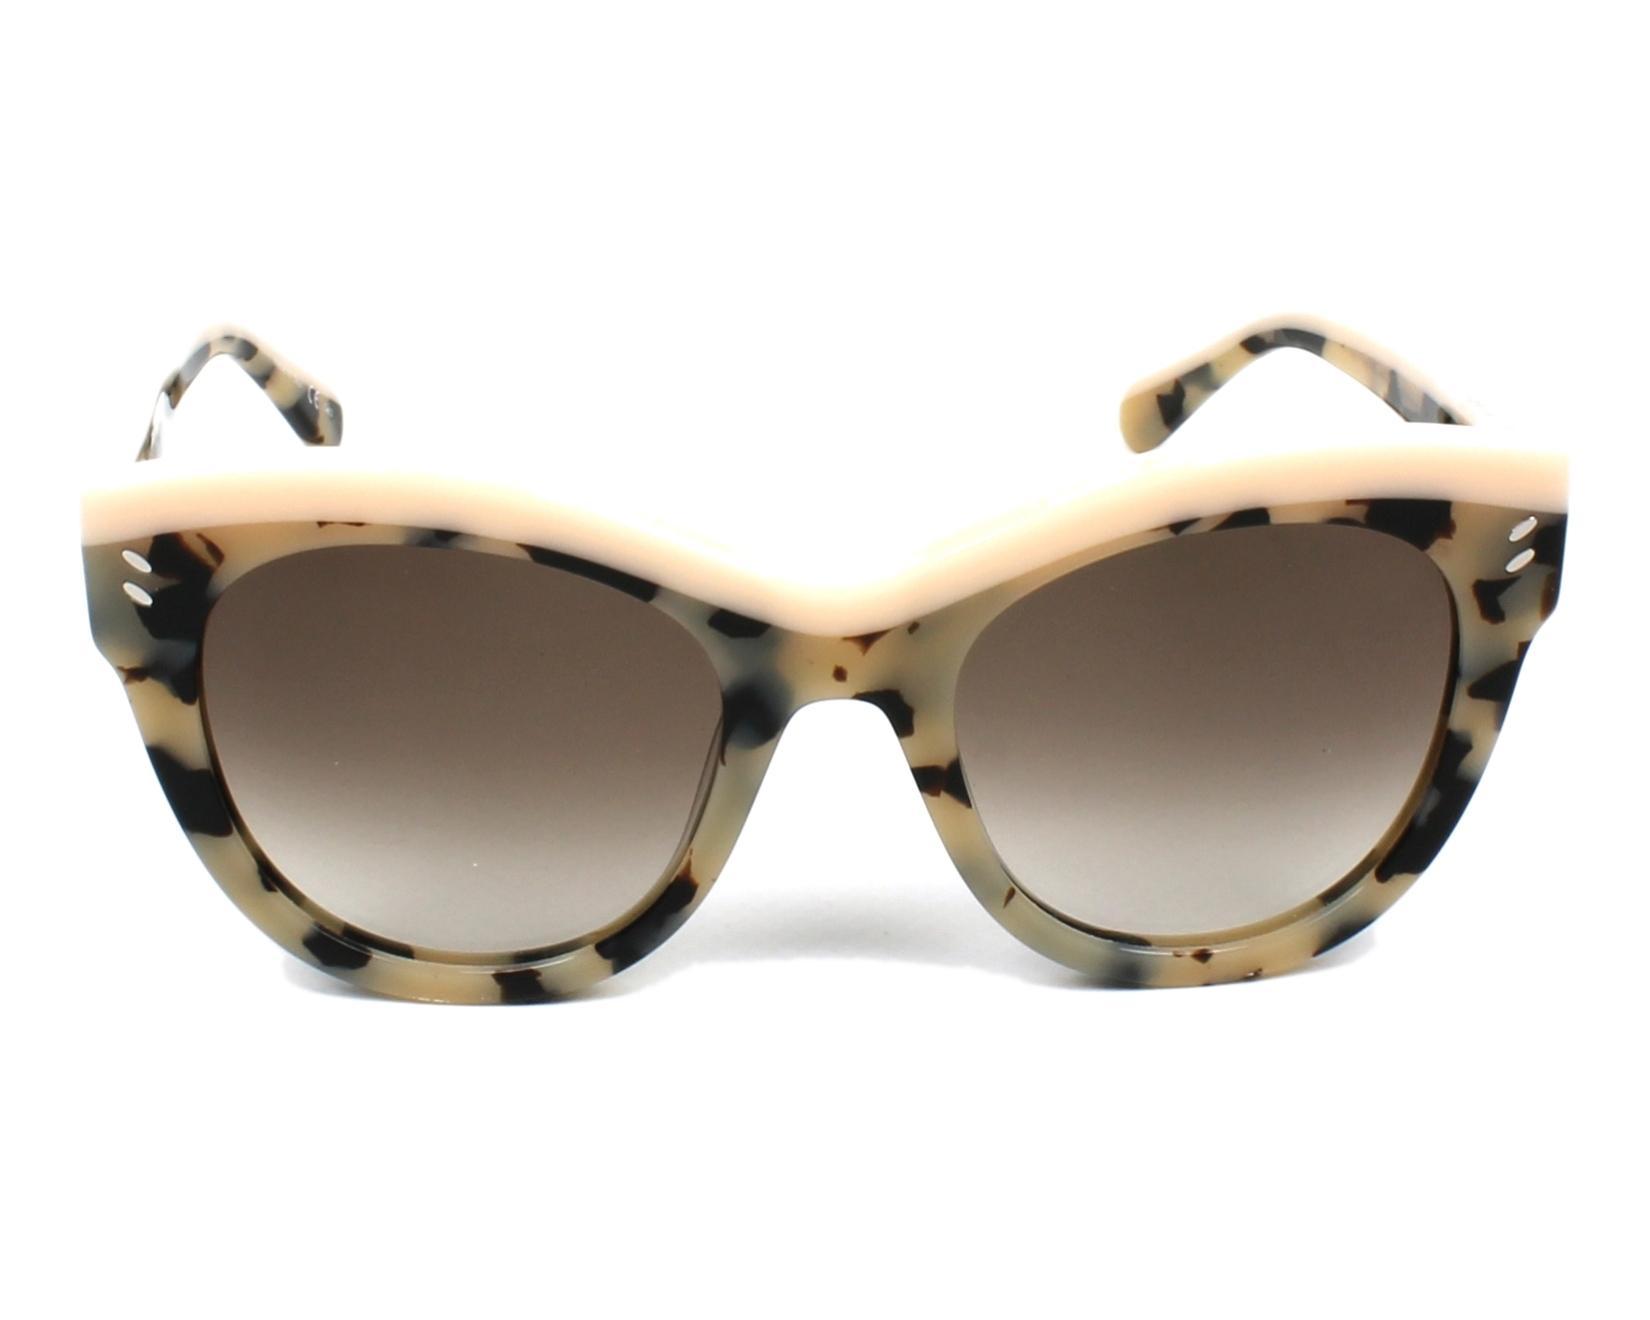 Stella McCartney 0021S Sonnenbrille Beige Rosa Havana 002 51mm kksNTd6